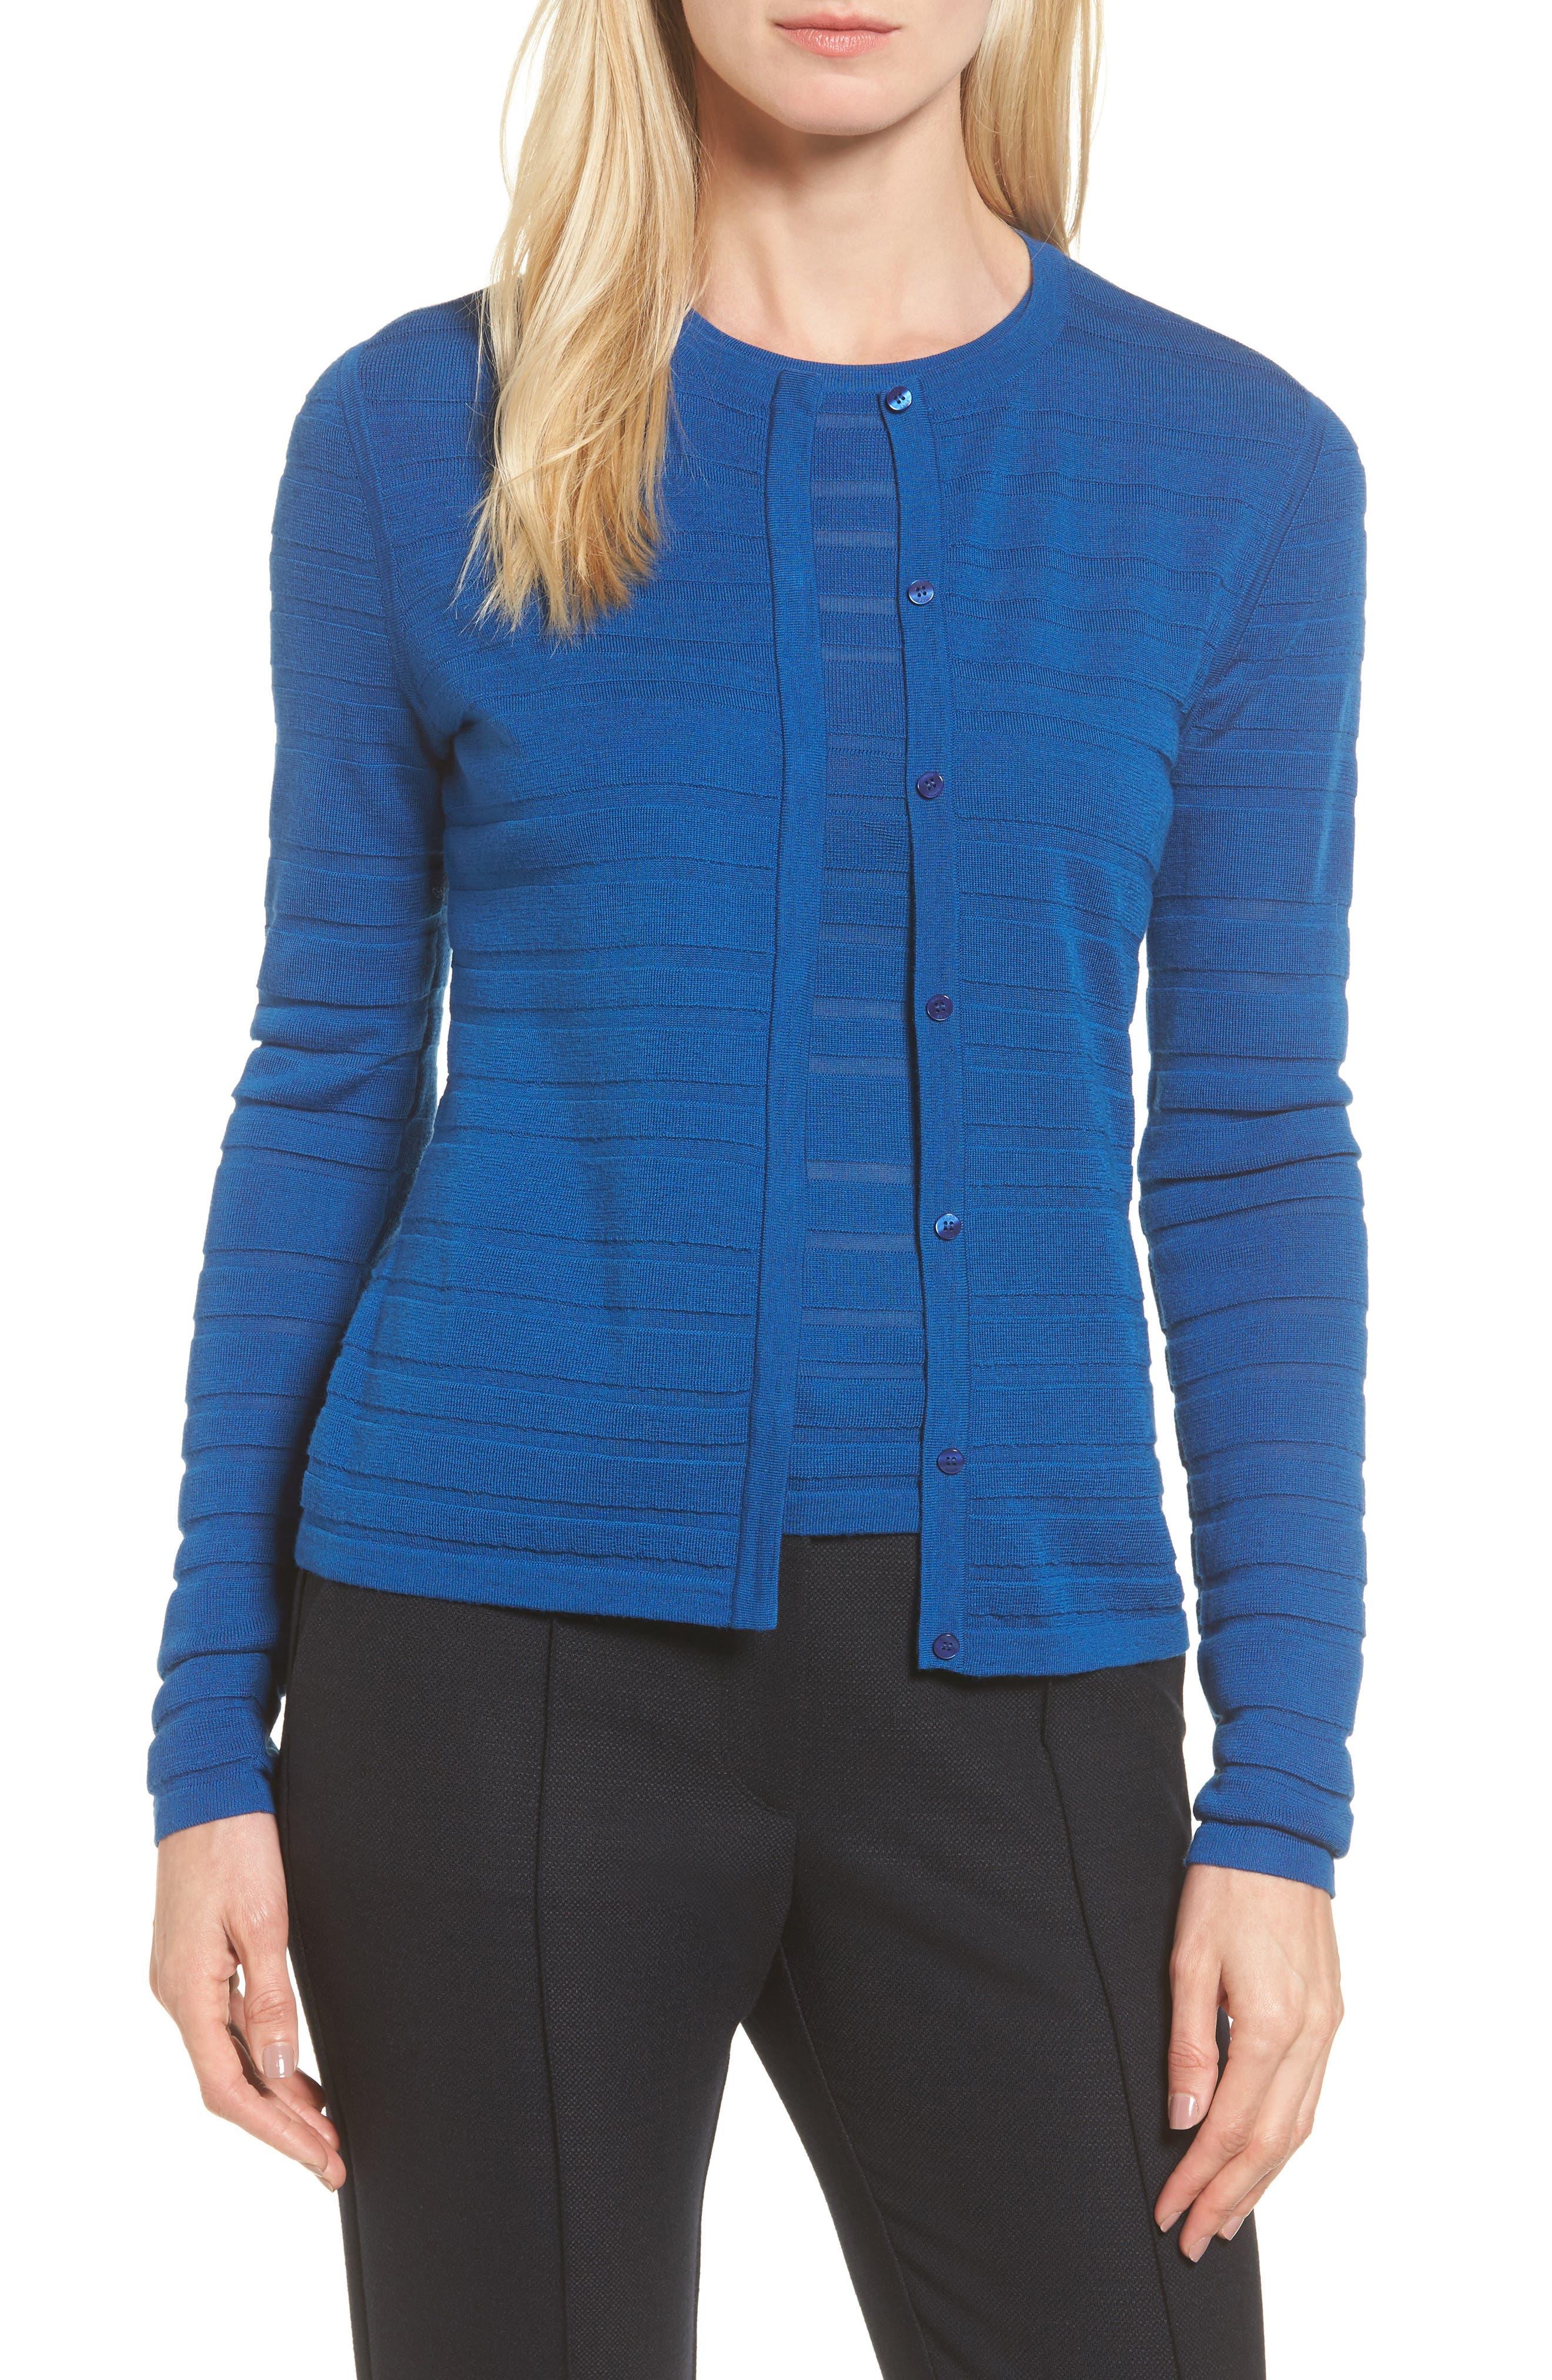 Fahsa Stripe Textured Wool Cardigan,                             Main thumbnail 1, color,                             Gentian Blue